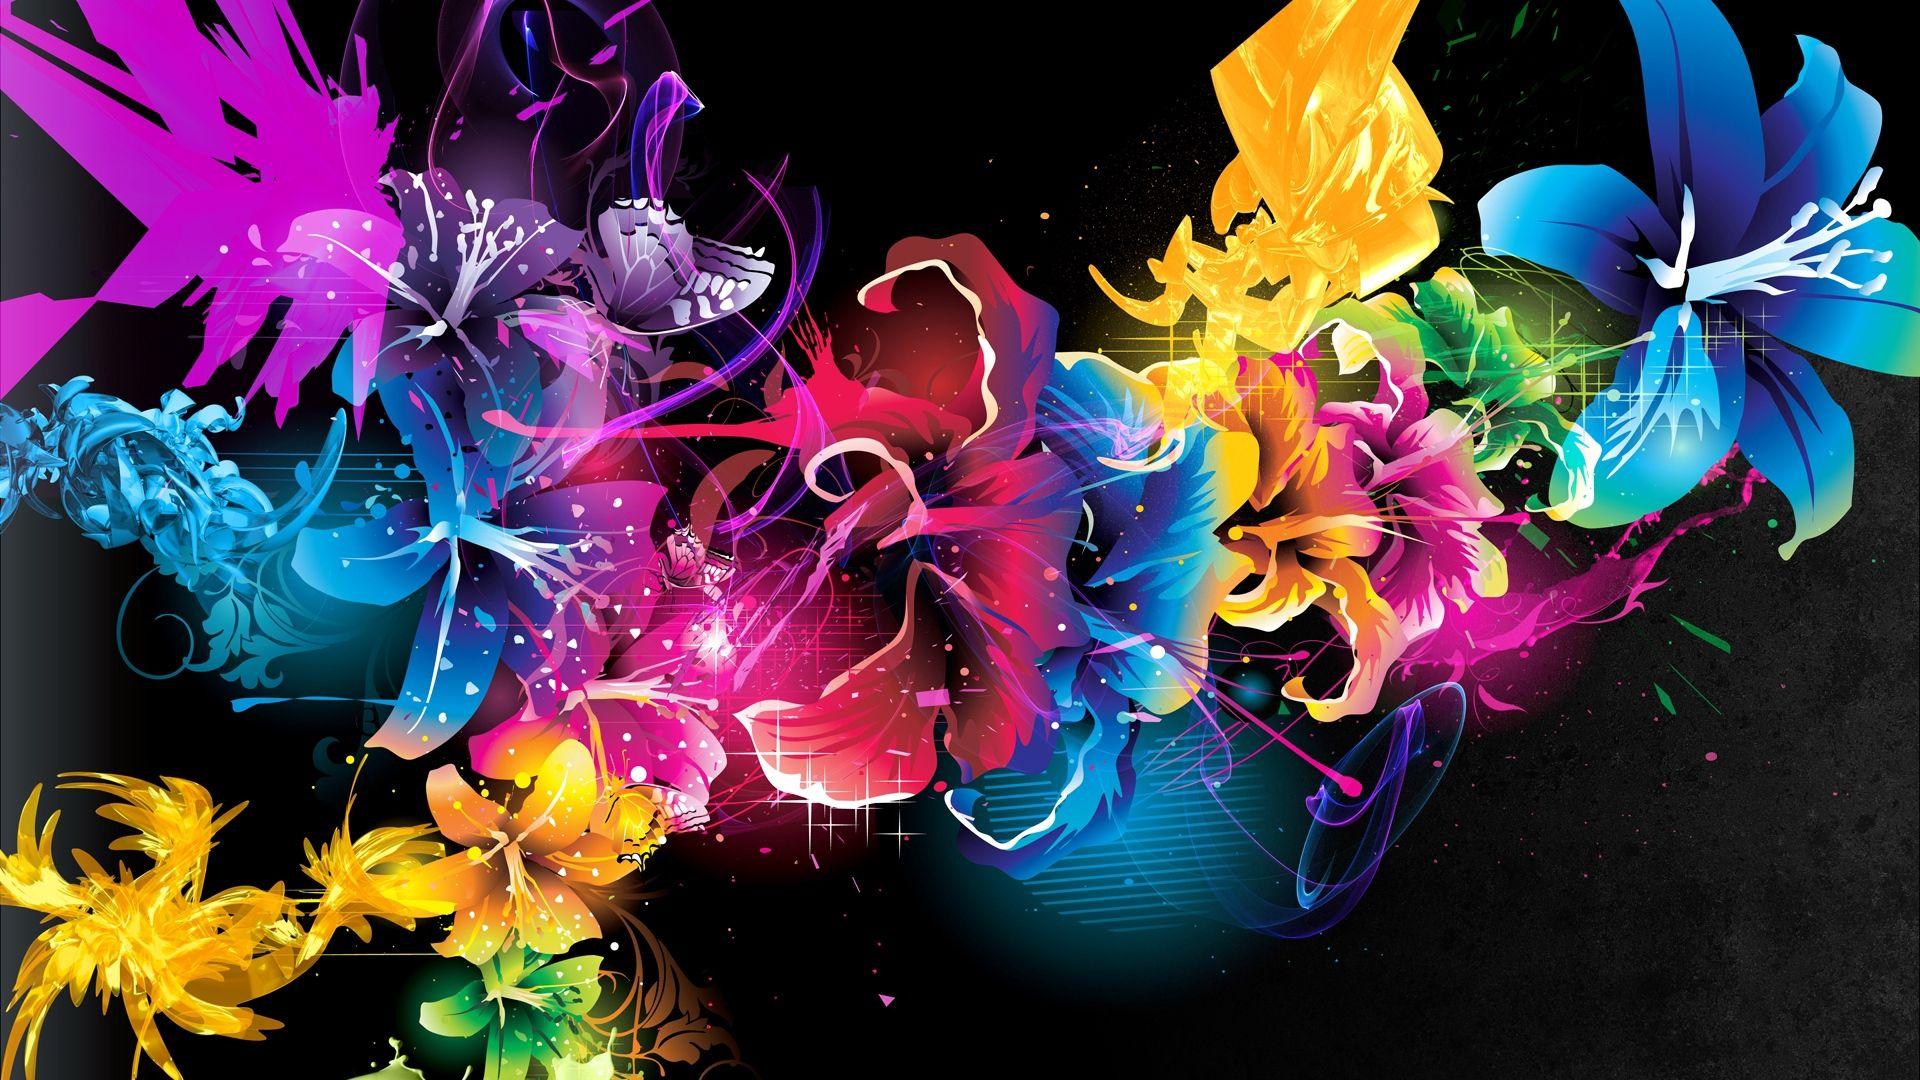 Graphic Design wallpaper download